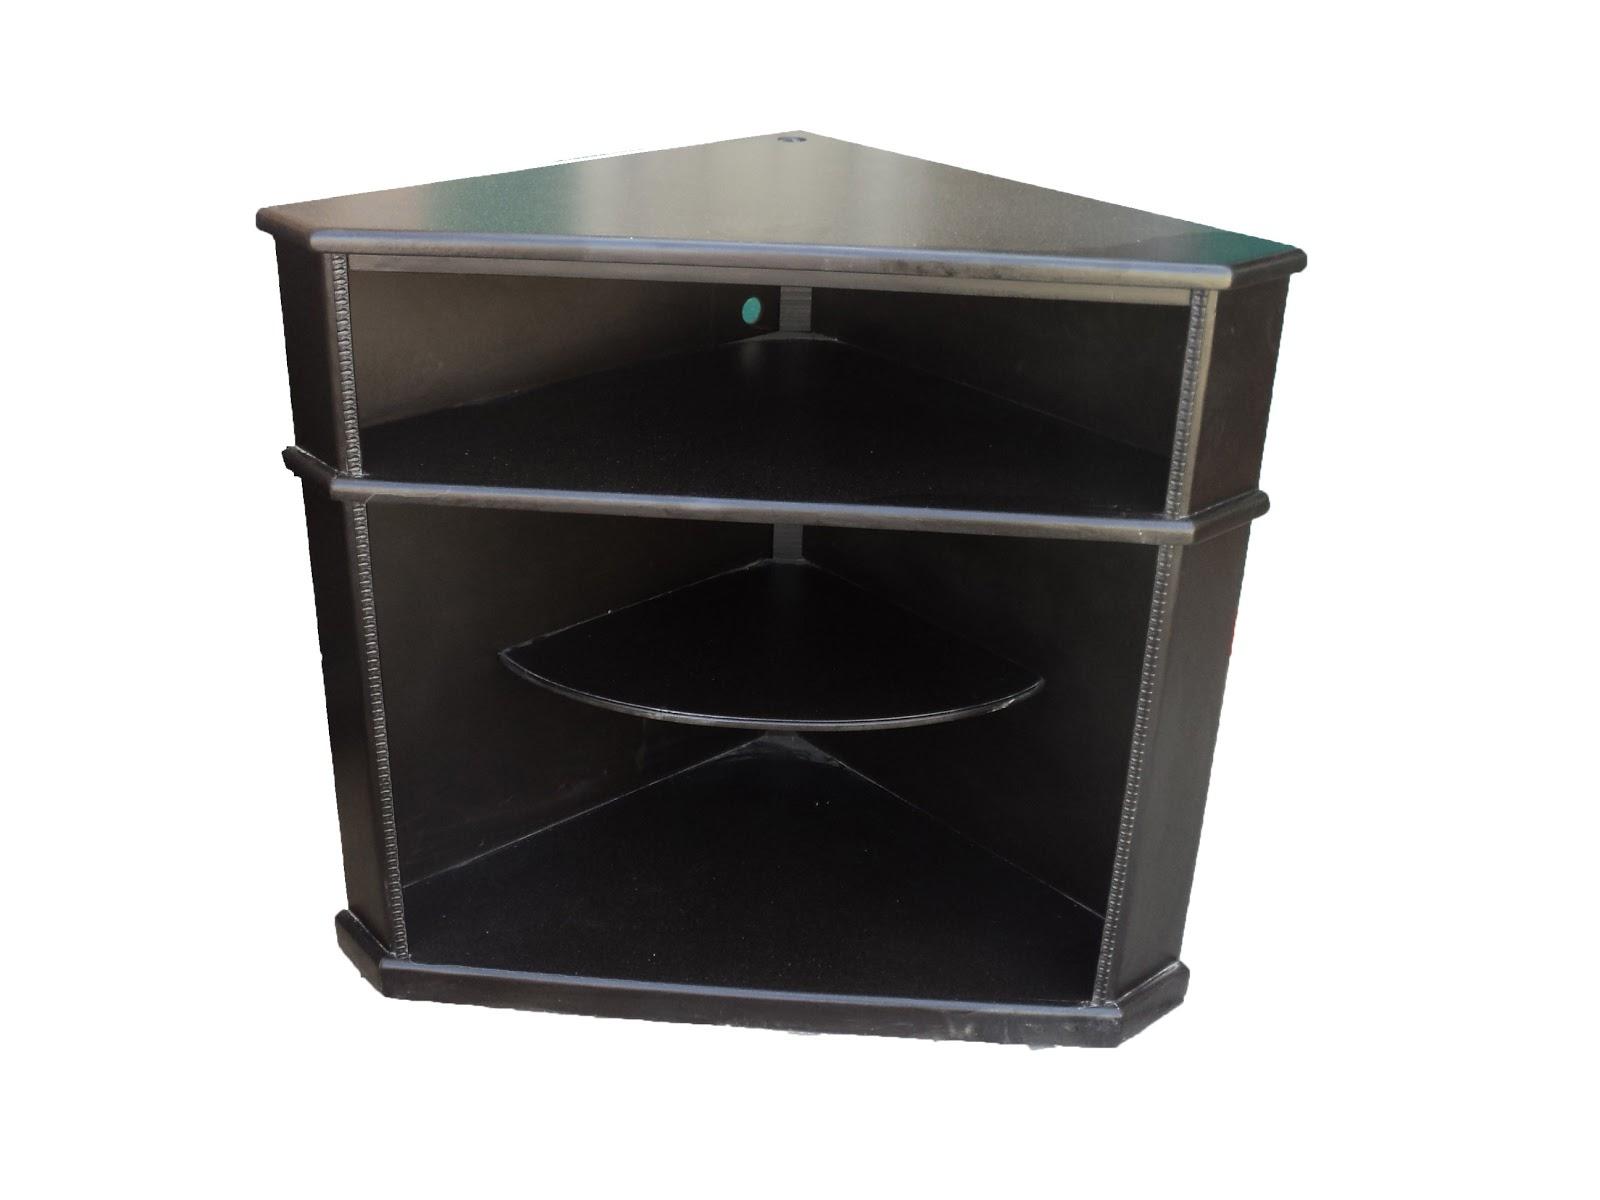 Centros entretenimiento para muebles minimalistas modernos for Muebles minimalistas